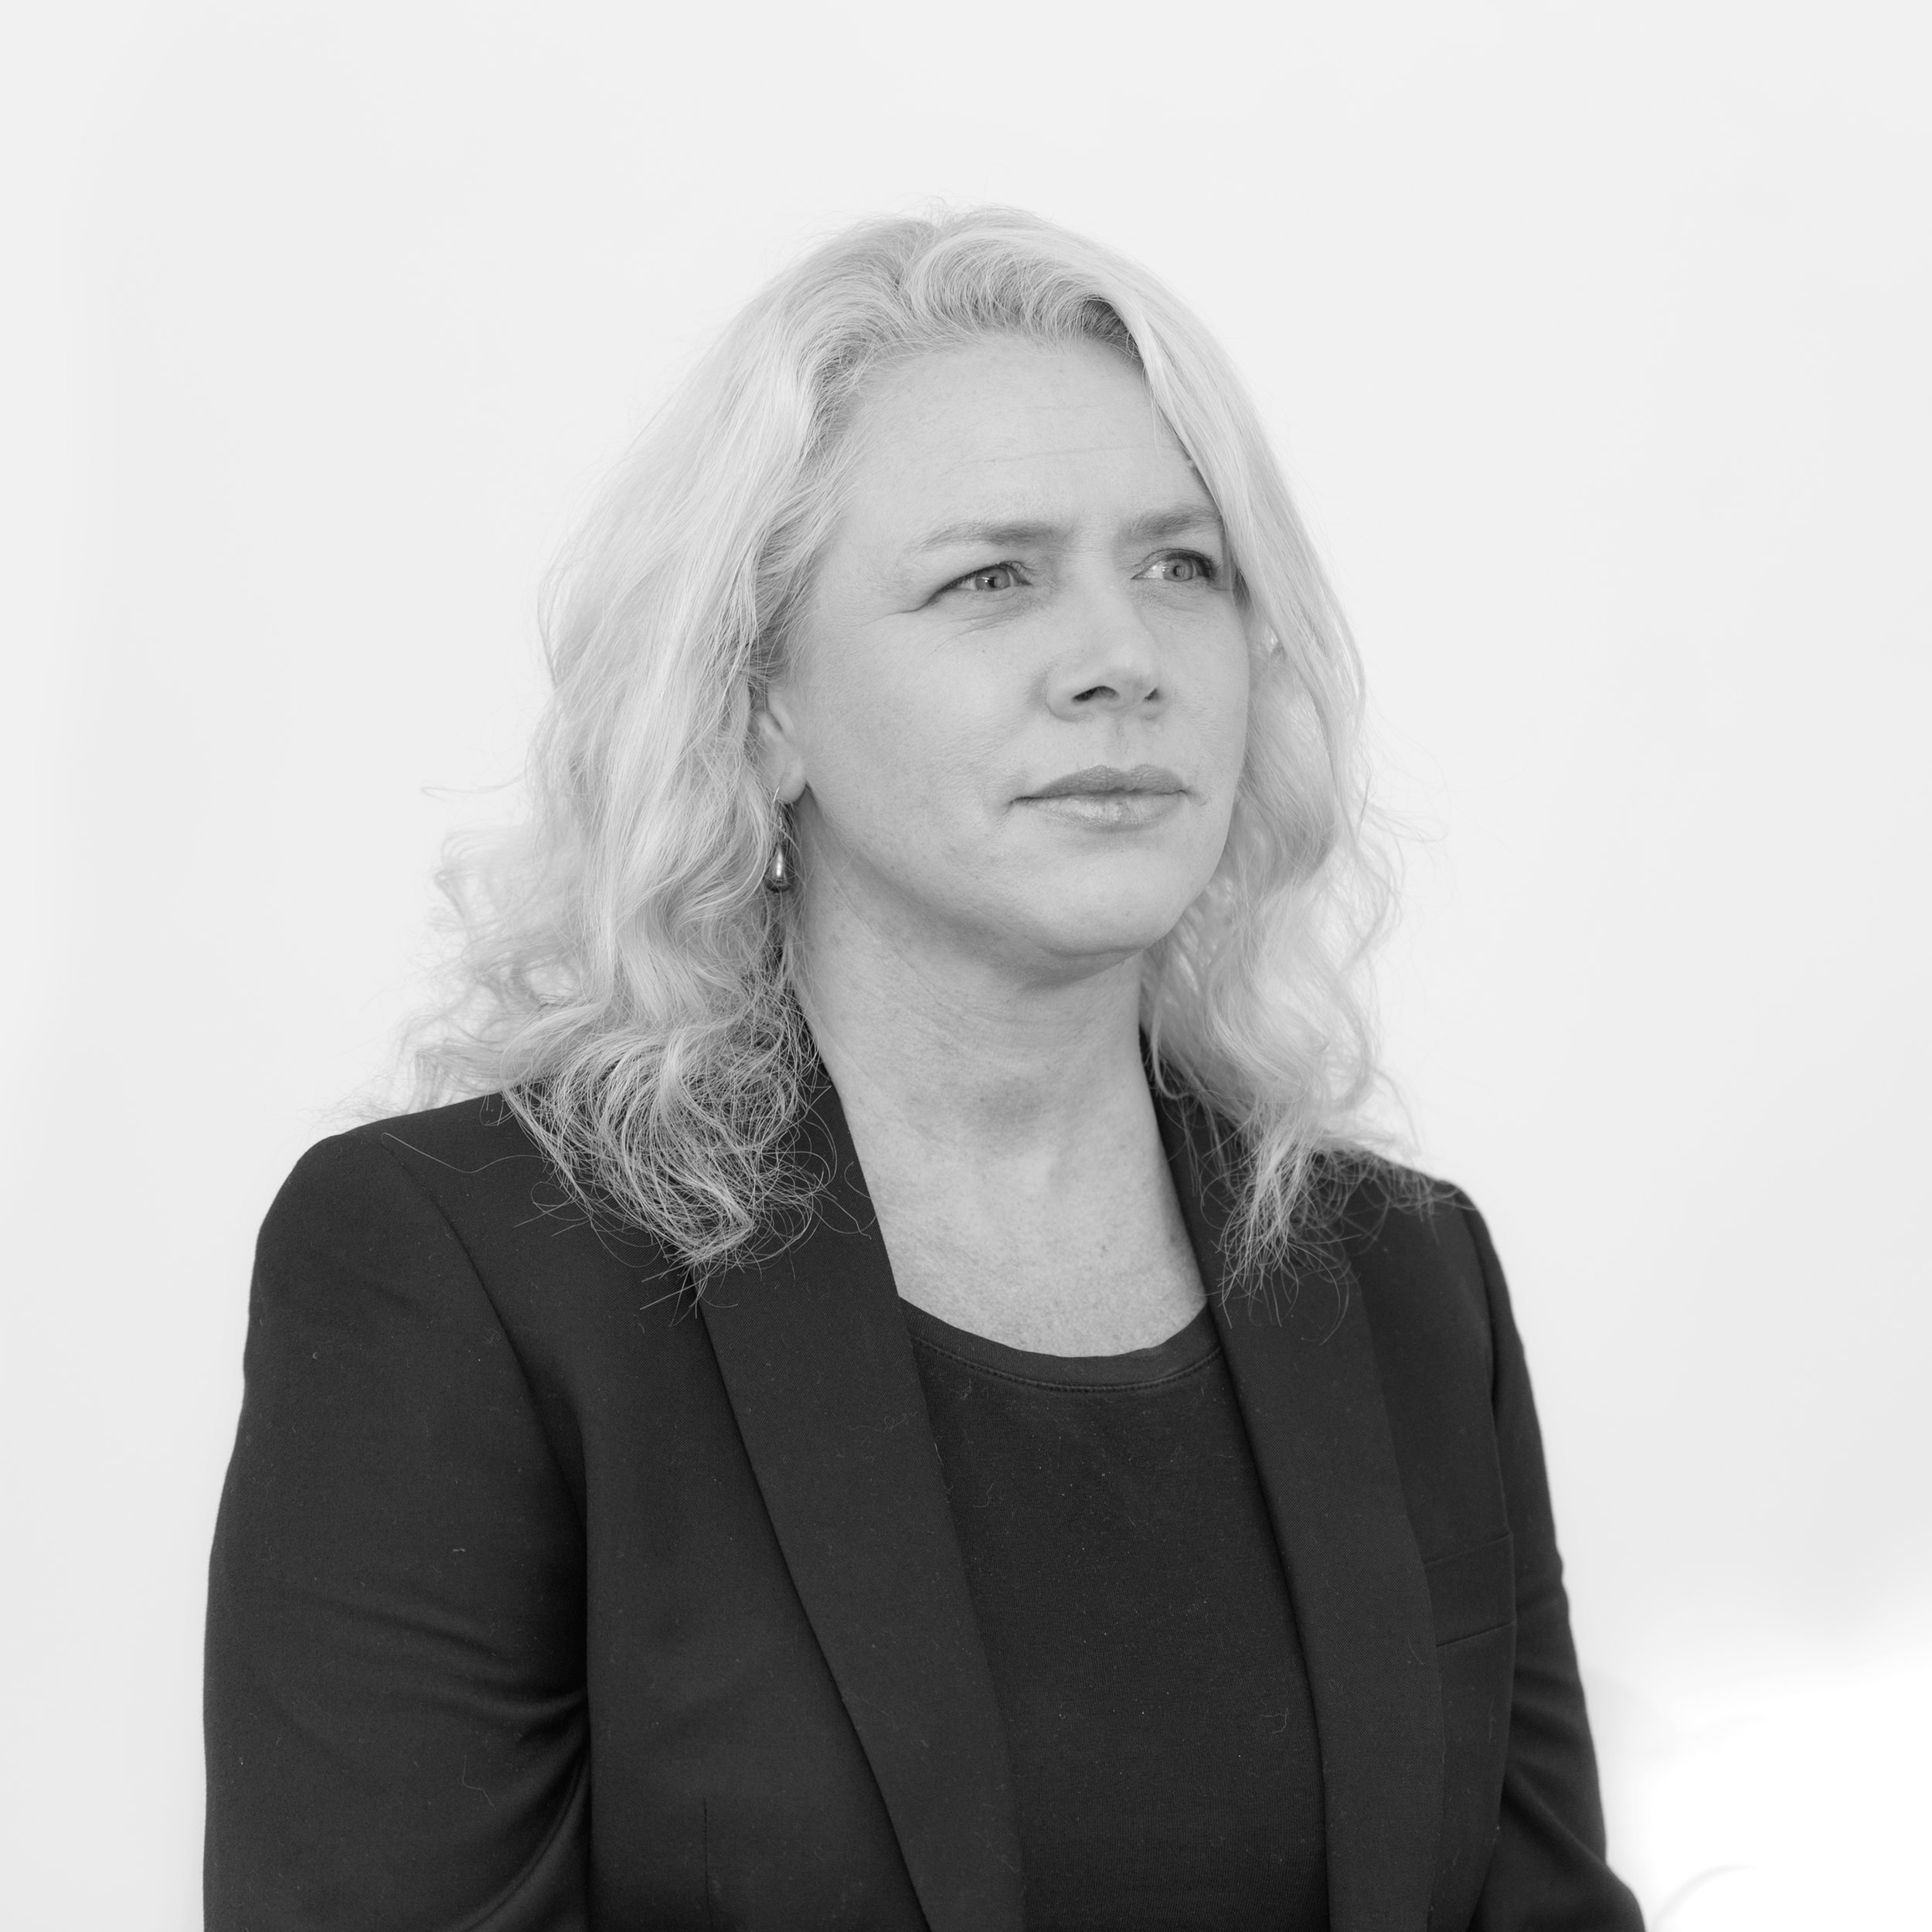 Tina Patriksson Bråthen